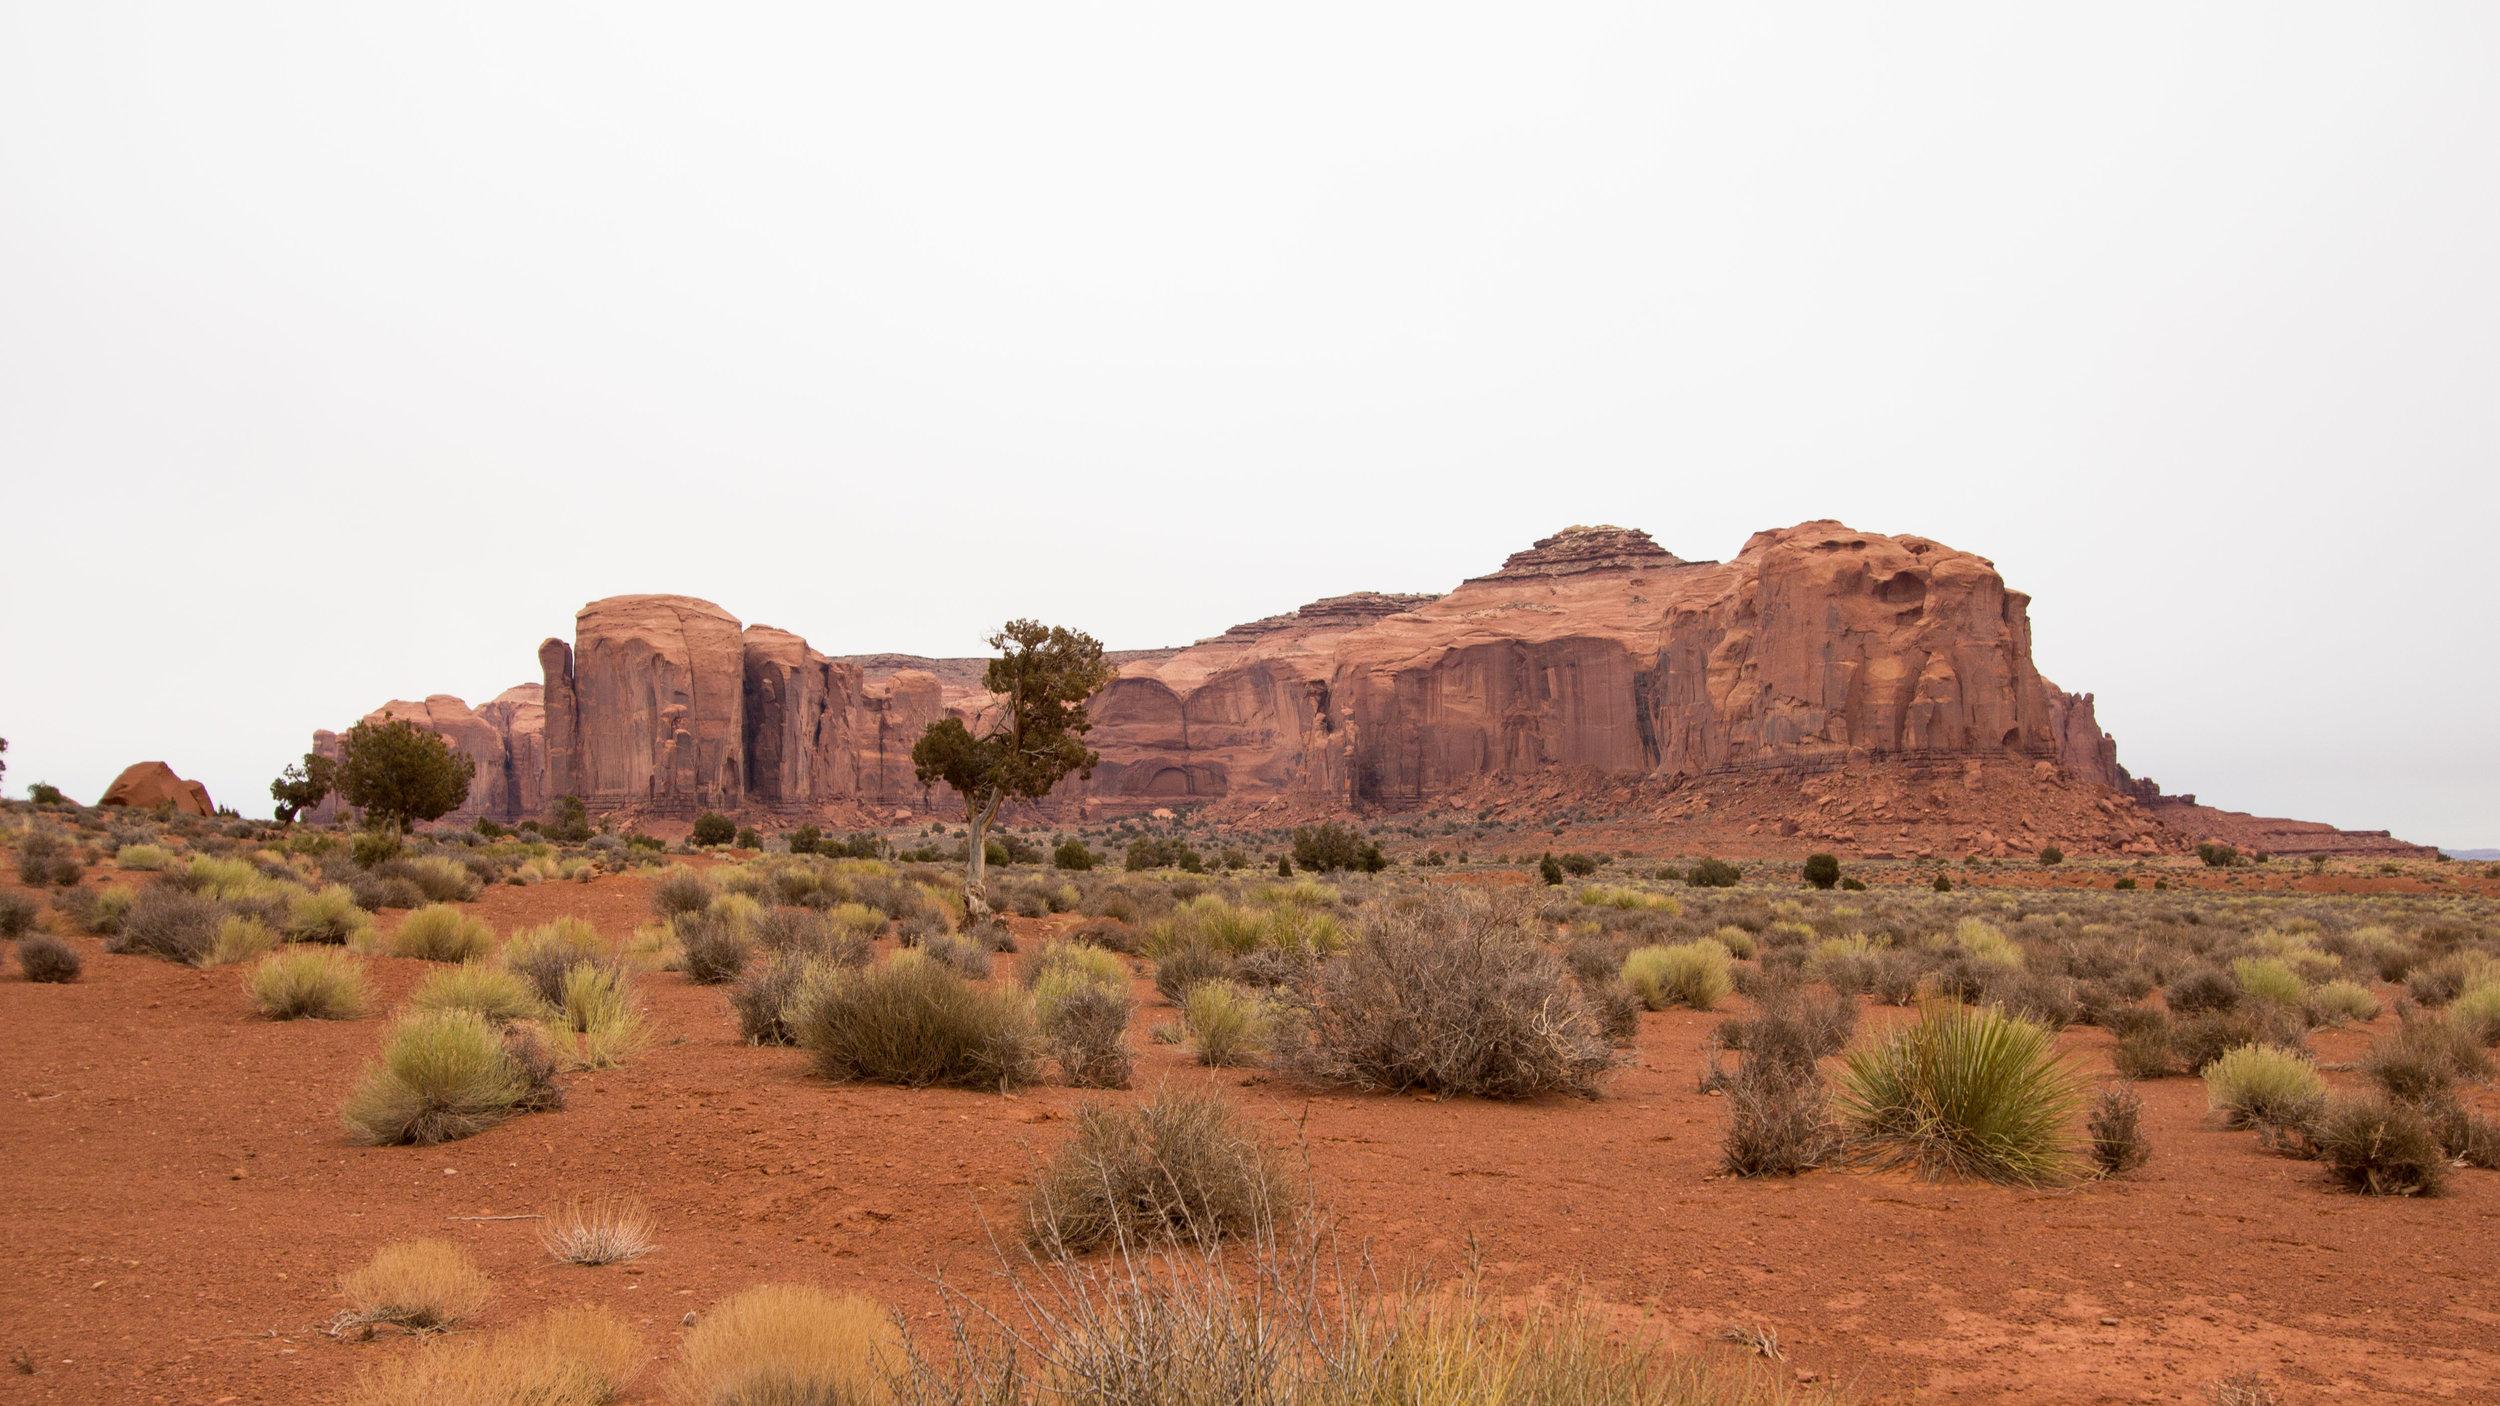 AMC_NavajoNation-2.jpg